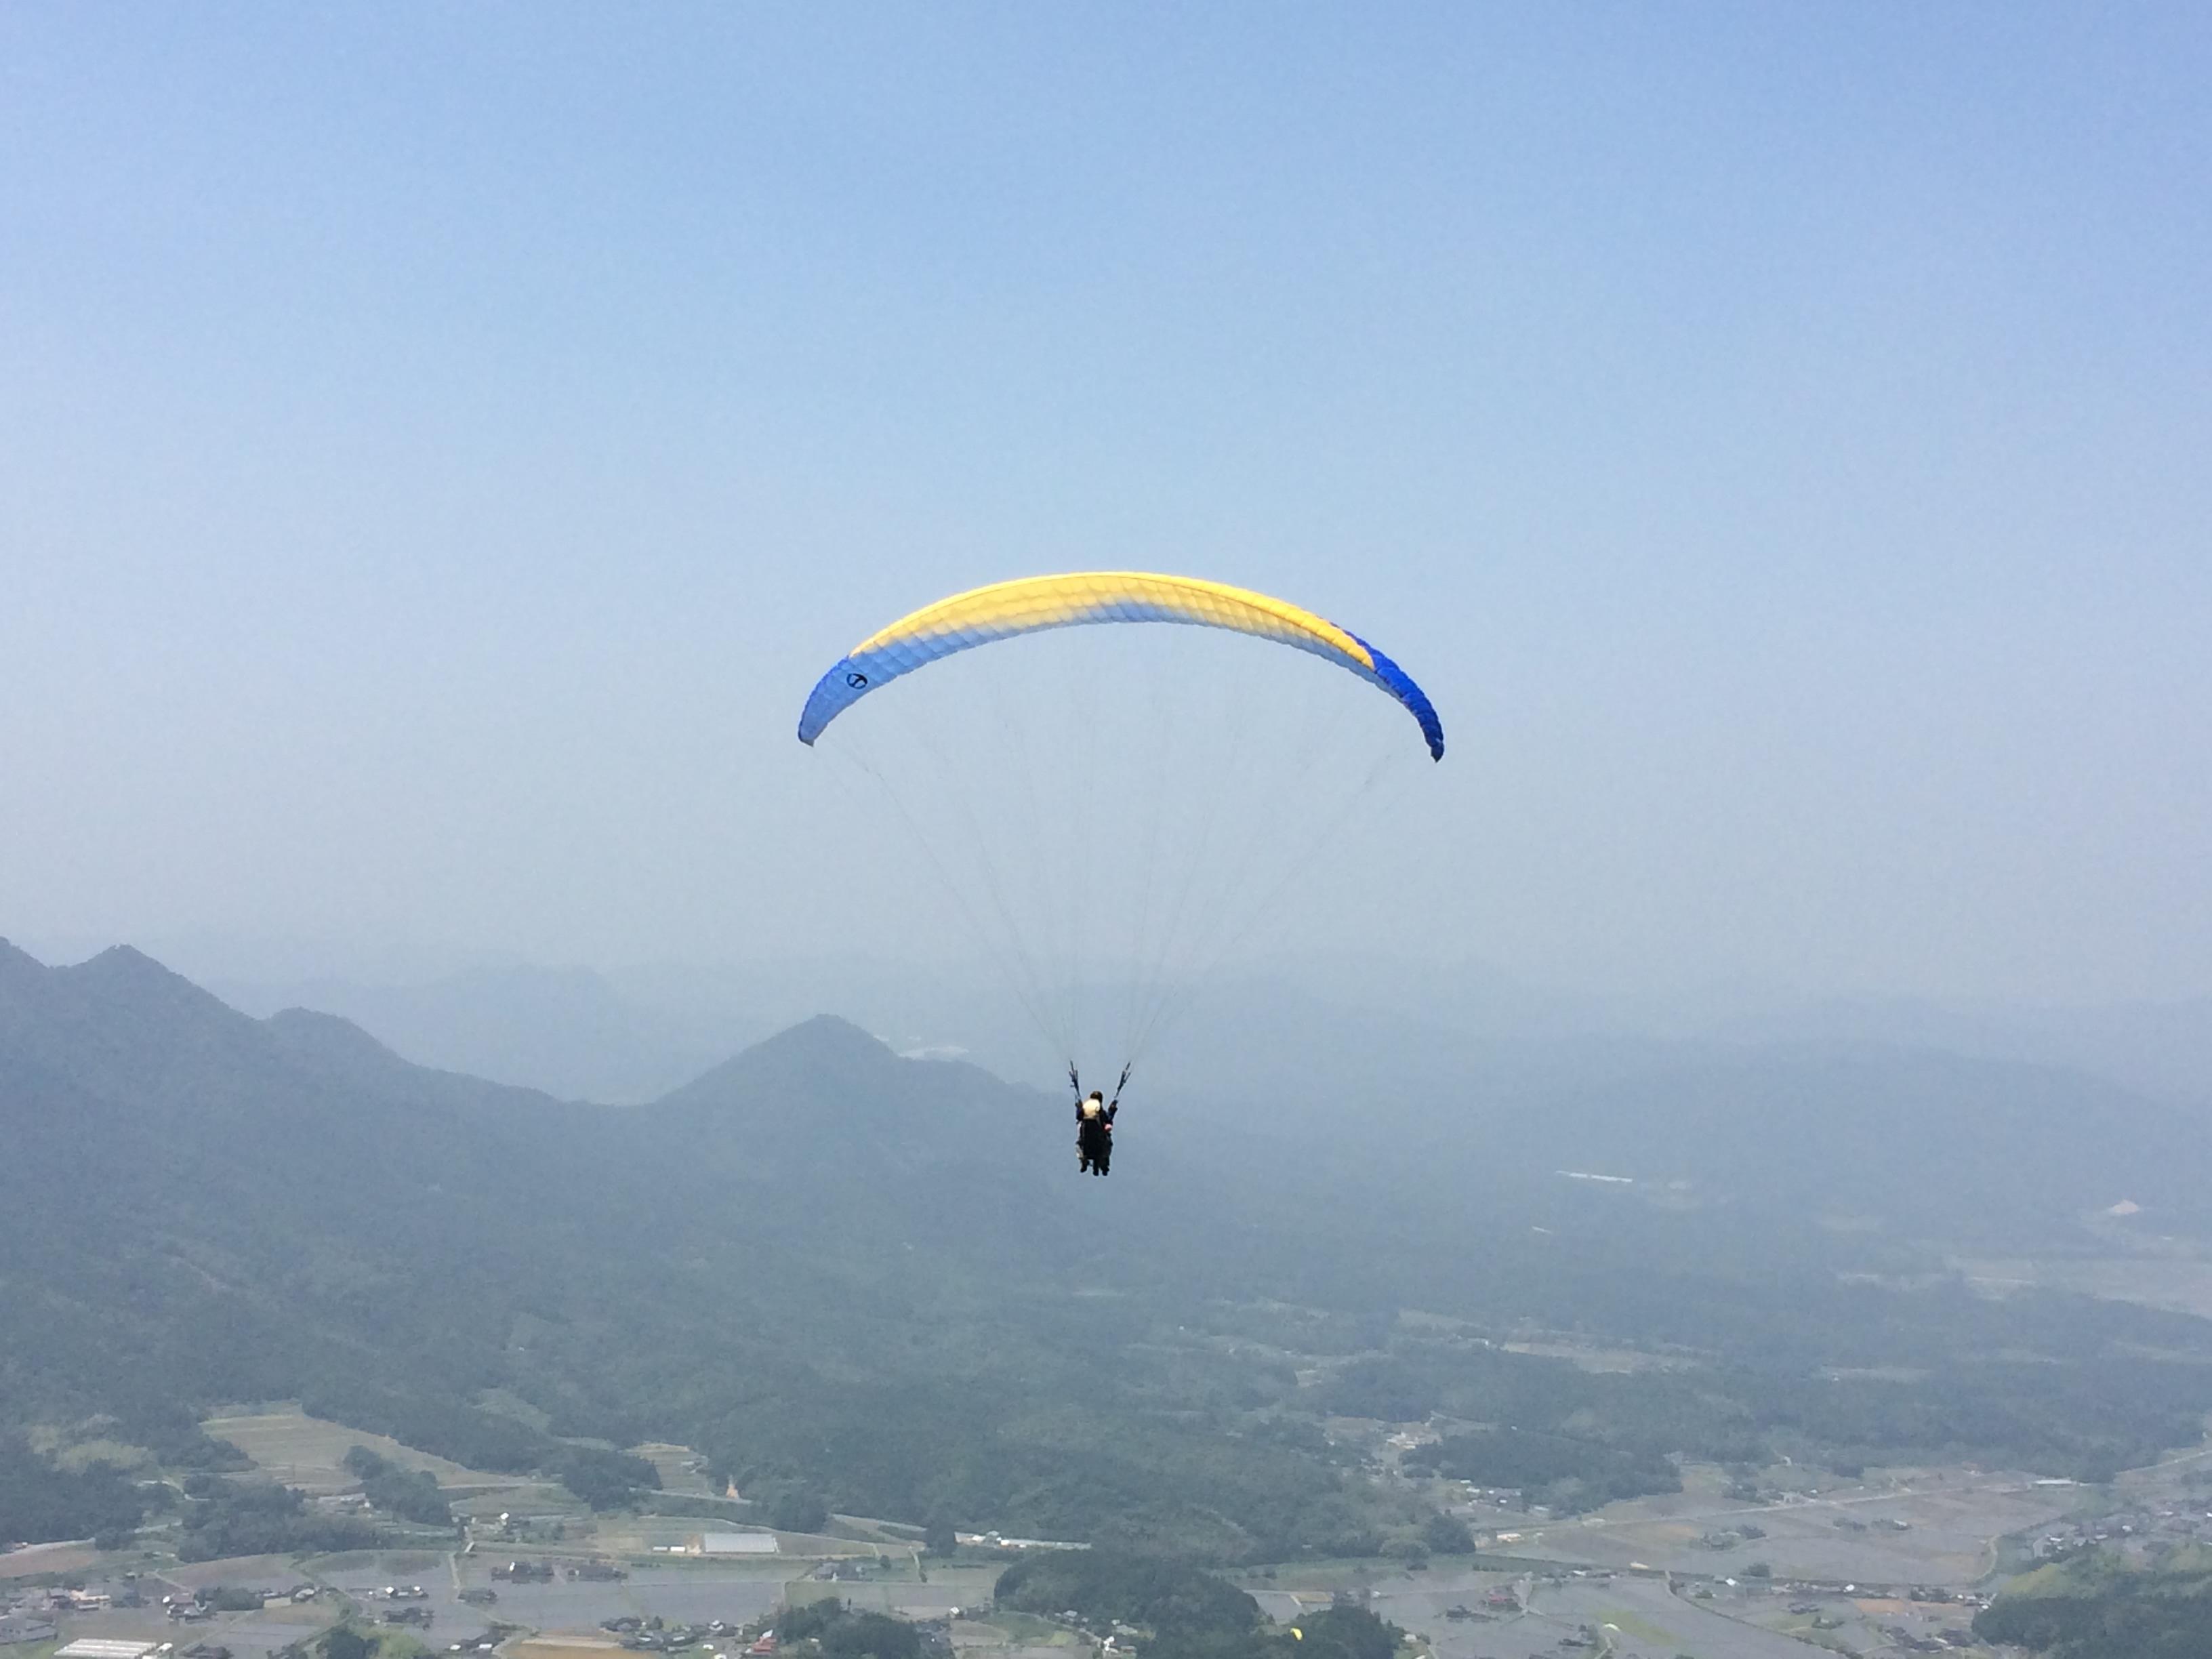 Enjoy Paragliding in Yamaguchi, Japan